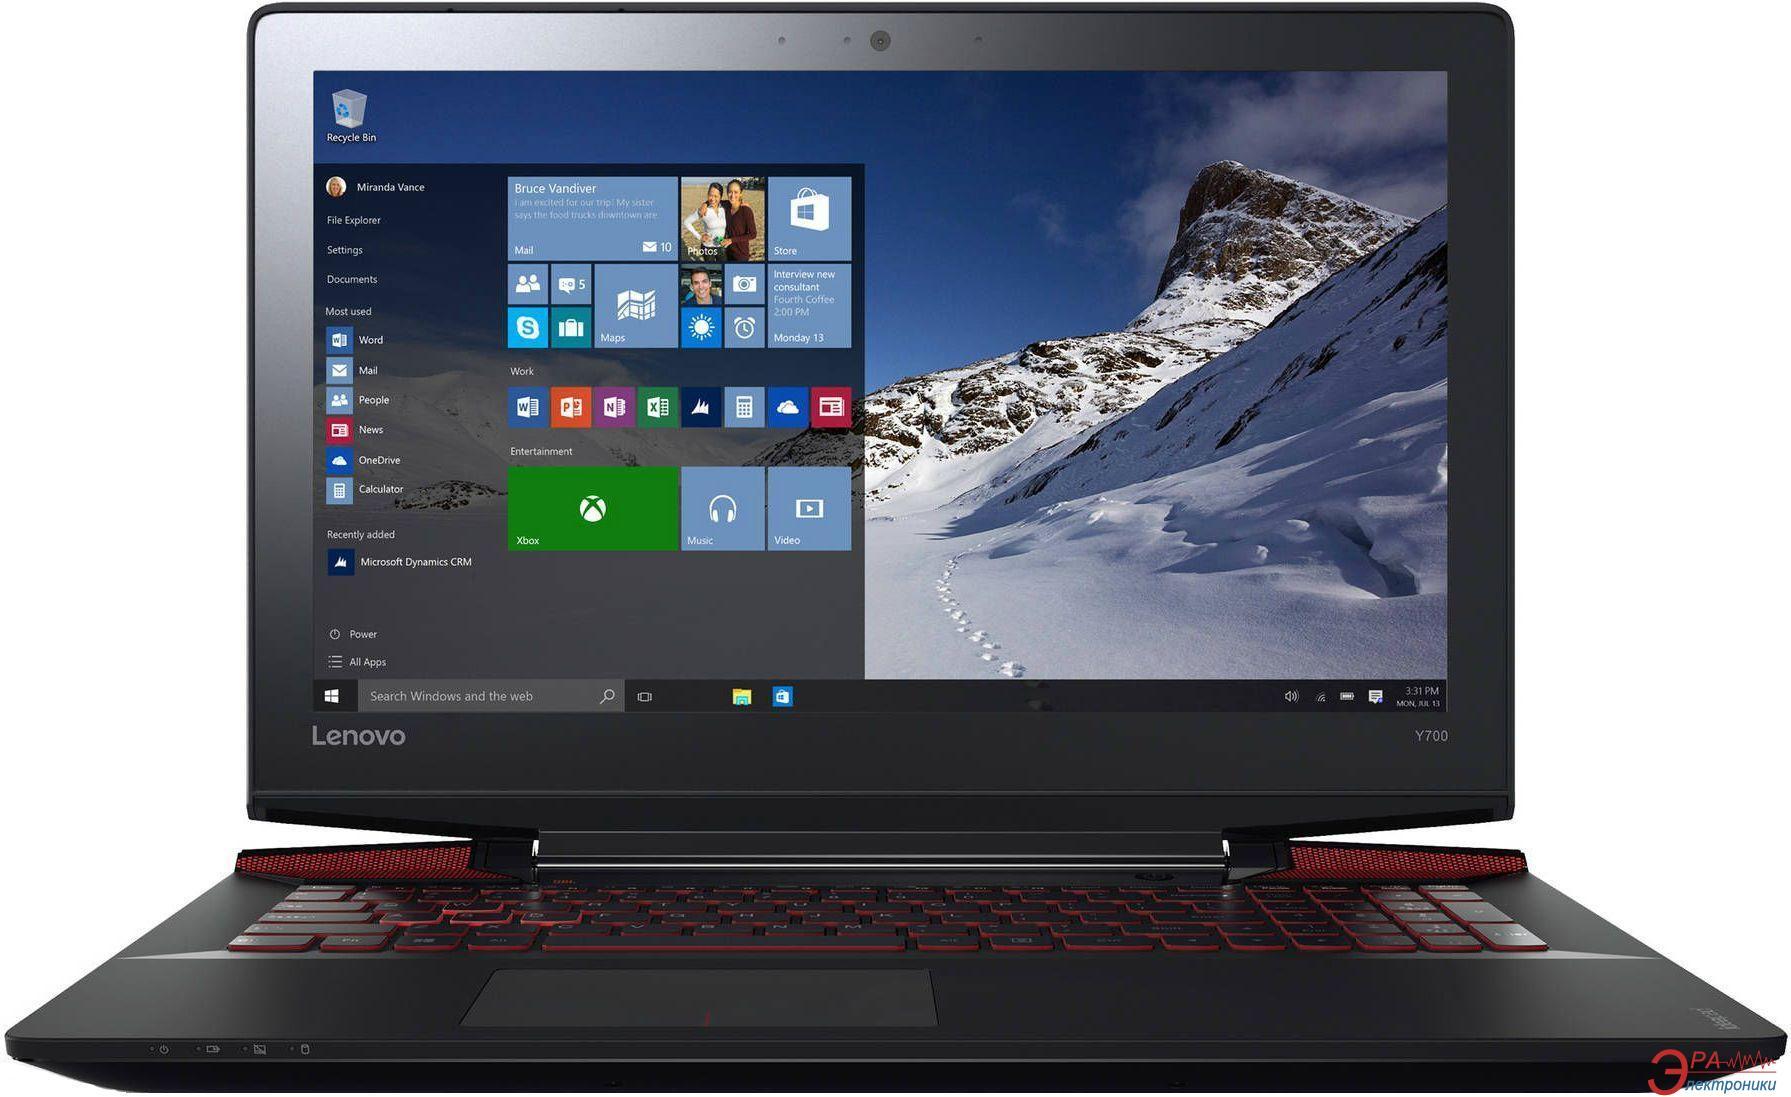 Ноутбук Lenovo IdeaPad Y700-15 (80NV00M4UA) Black 15,6